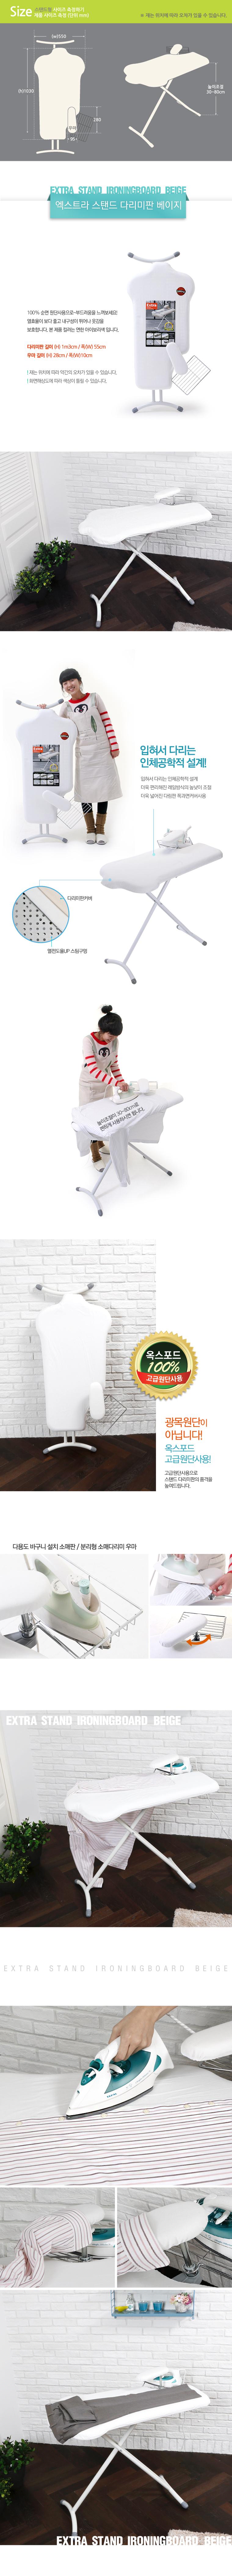 [ seachang ] Extra stand ferro da stiro